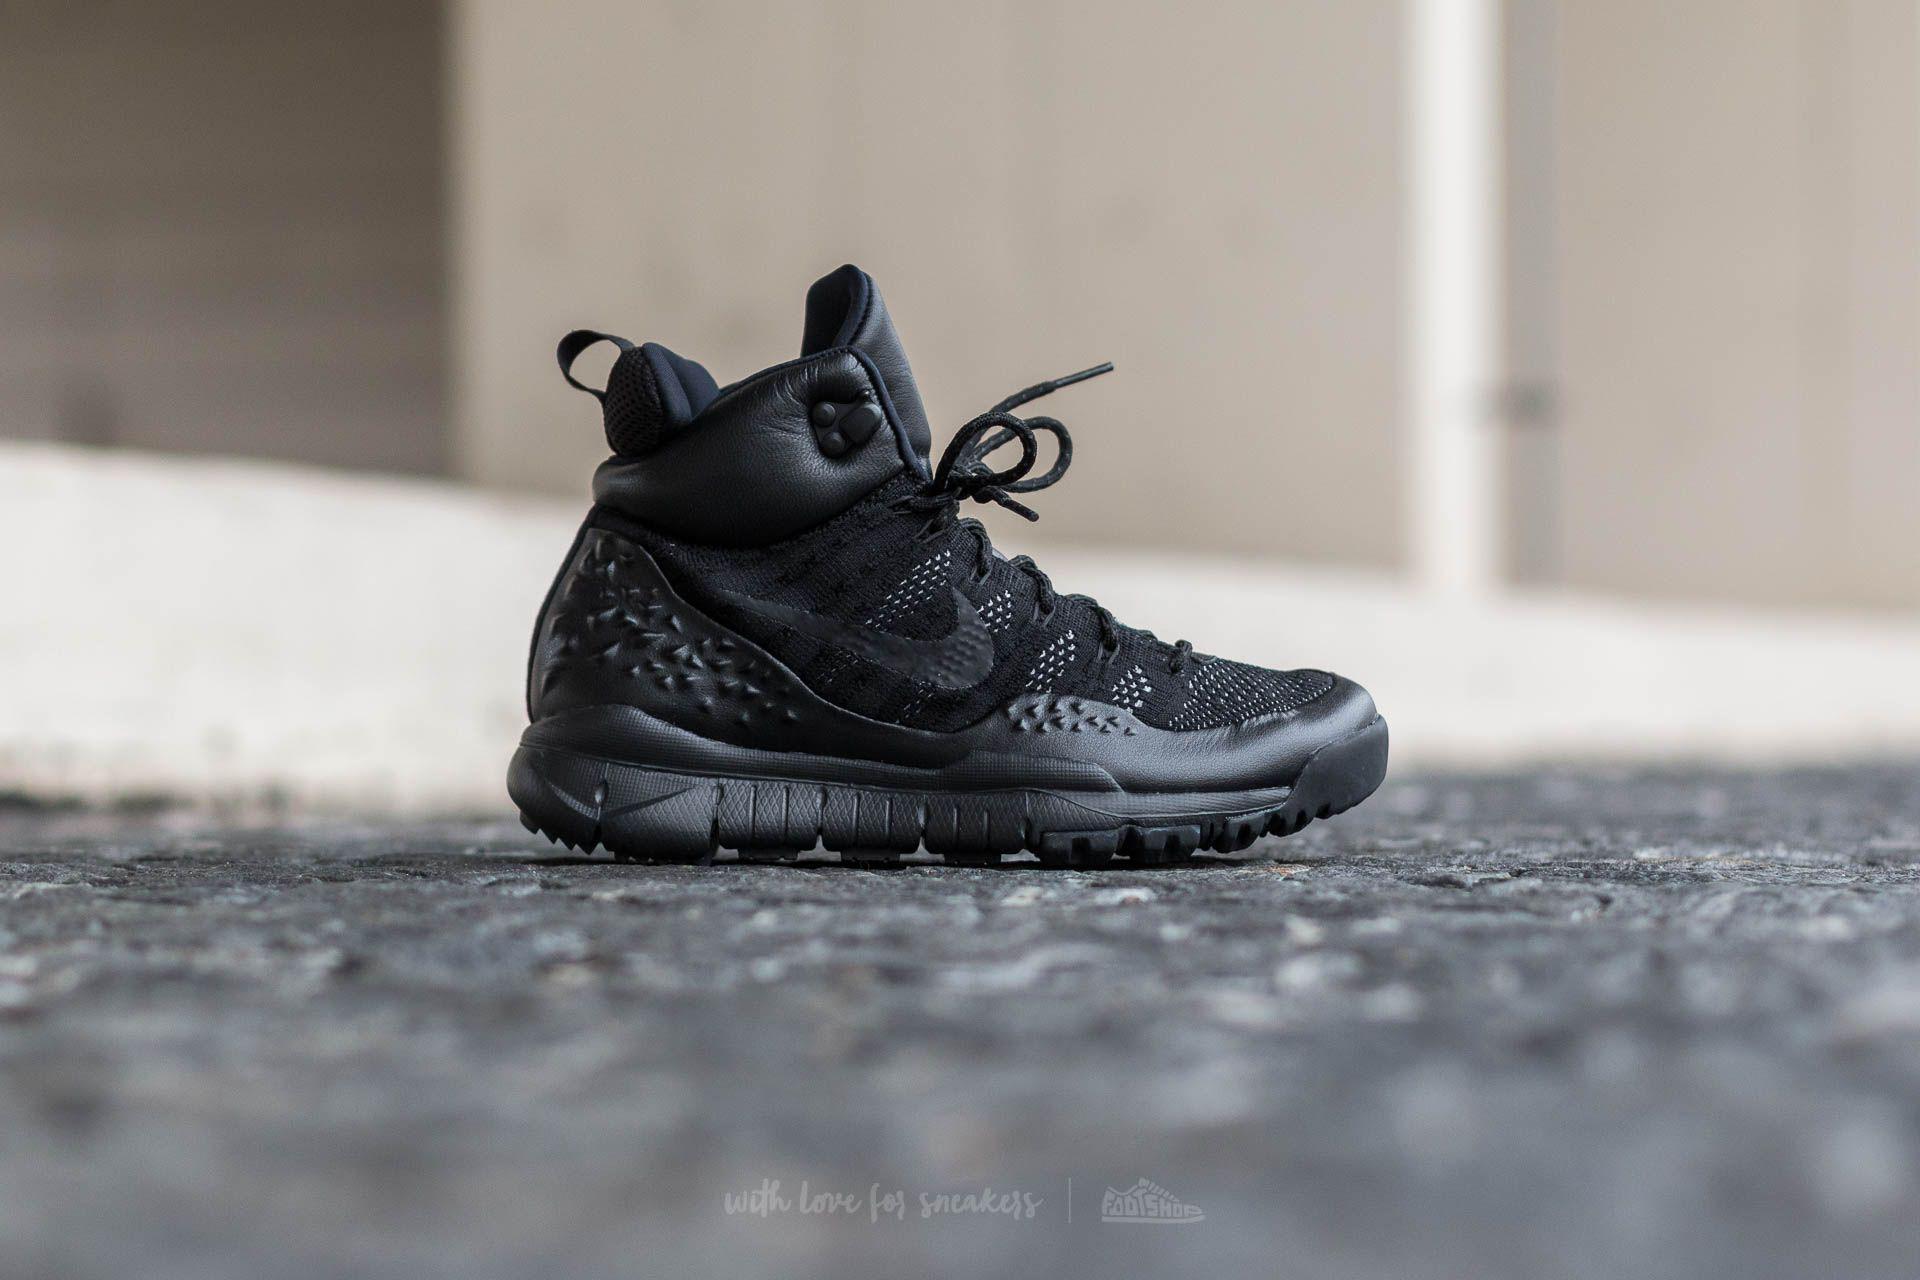 official photos 0e03e fdaf1 Lyst - Nike Wmns Lupinek Flyknit Black  Black-anthracite in Black